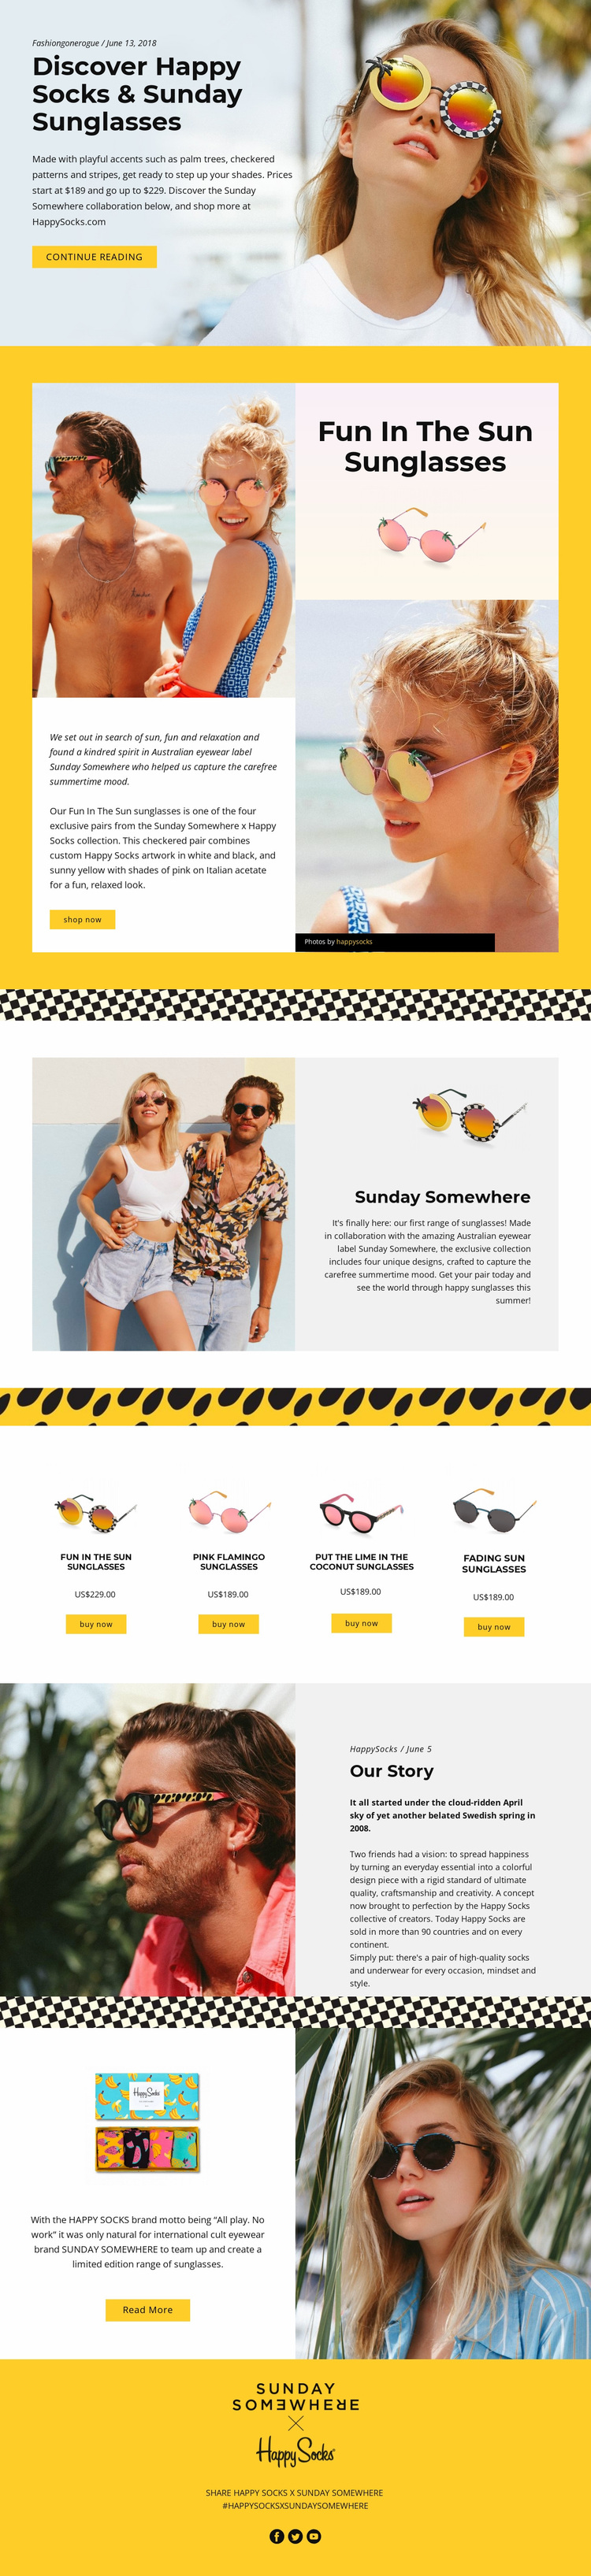 Fun Sunglasses Website Design